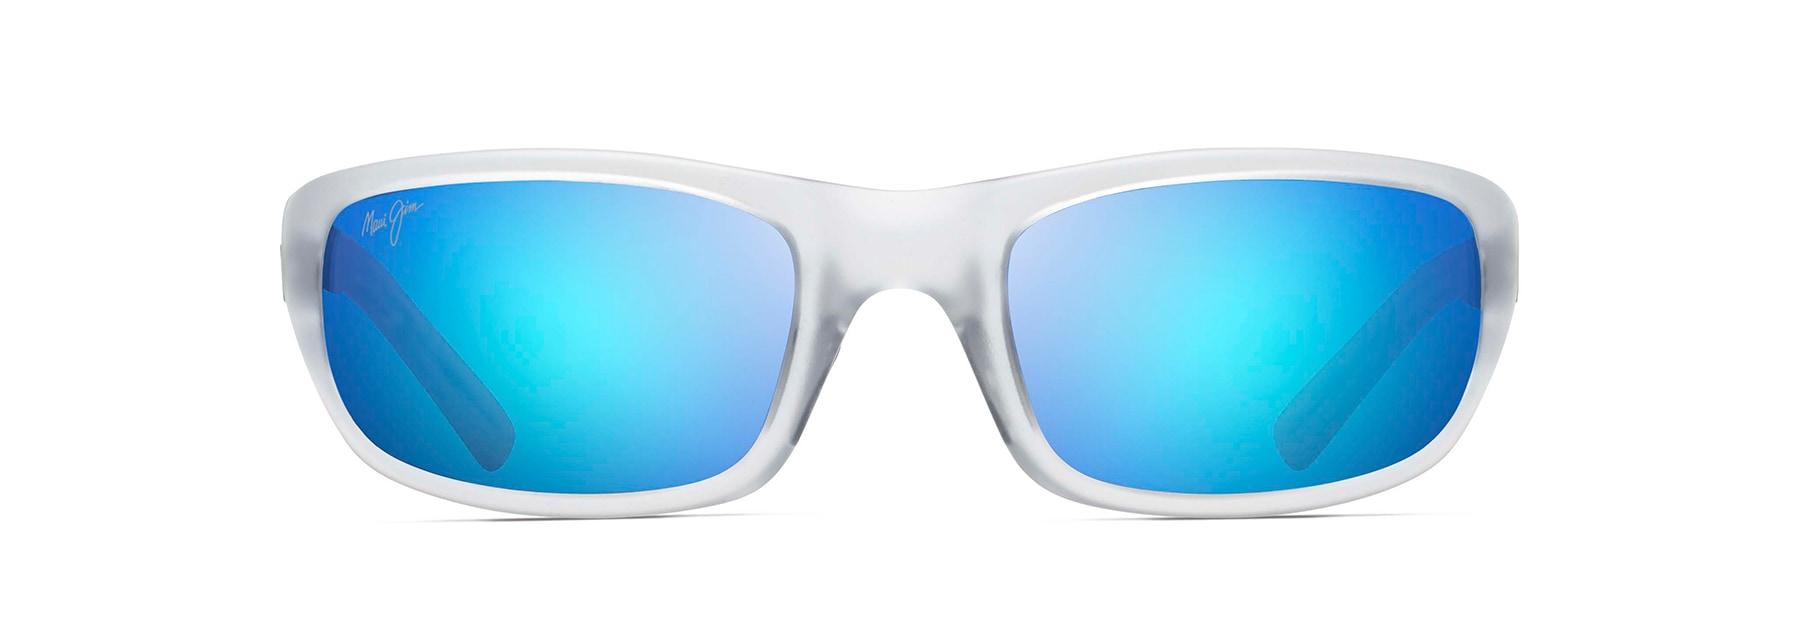 3aaba466d9 Stingray Polarised Sunglasses